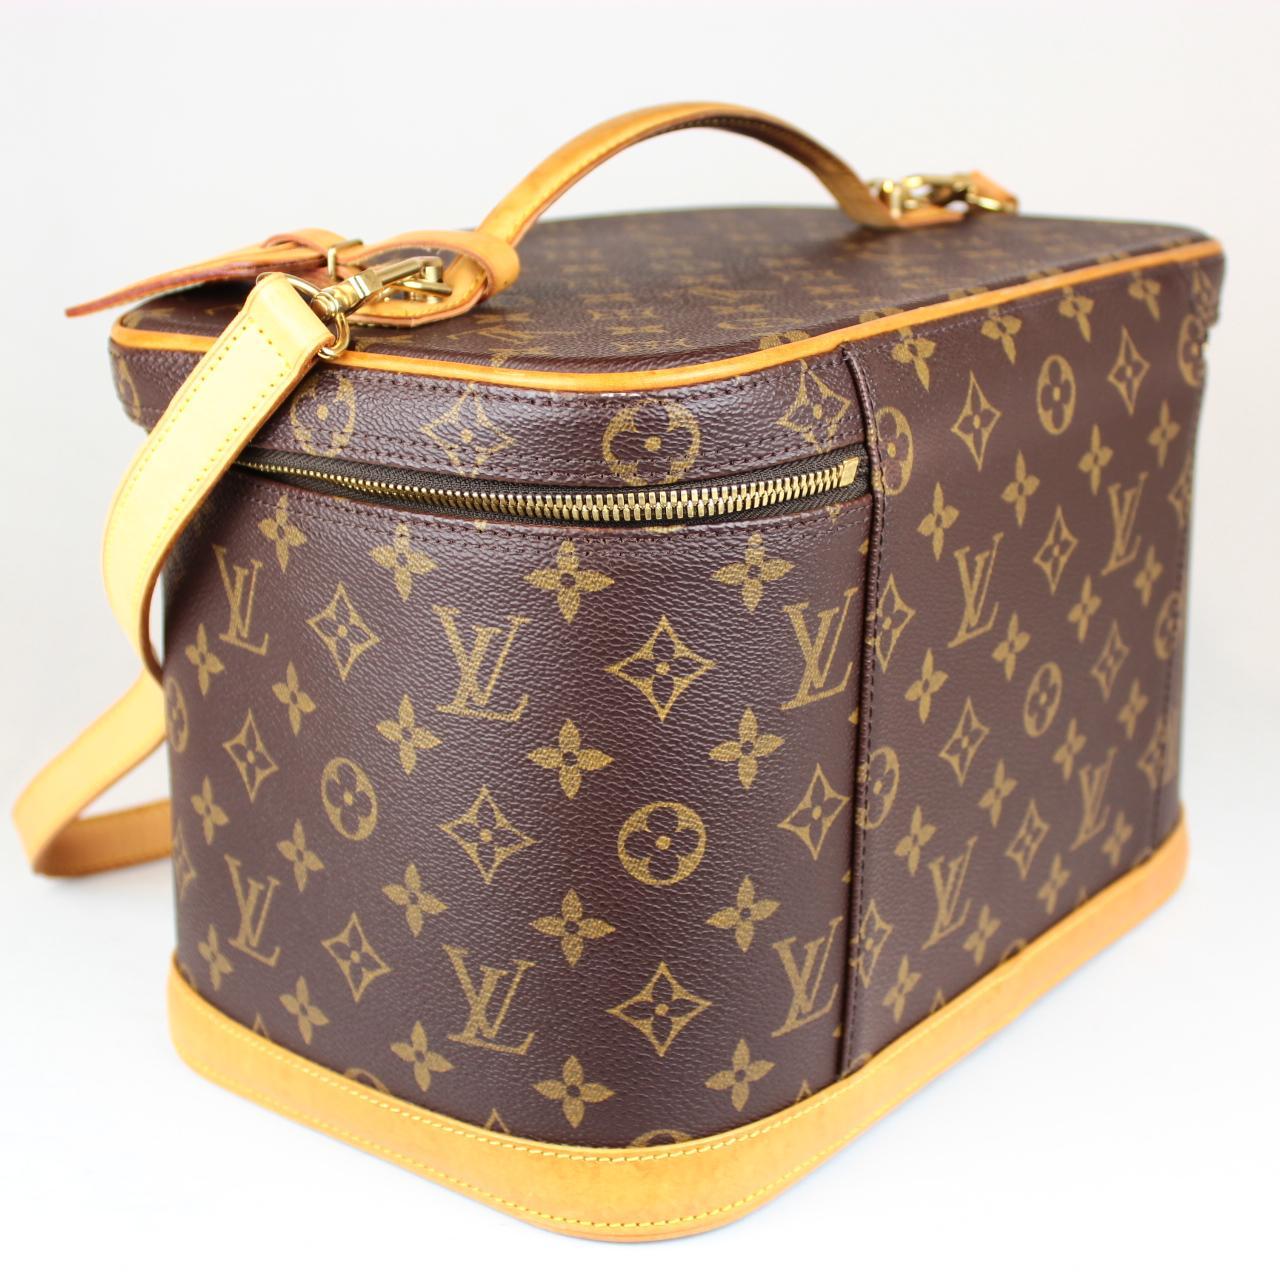 Auth Louis Vuitton Monogram Canvas Cosmetic Bag Vanity